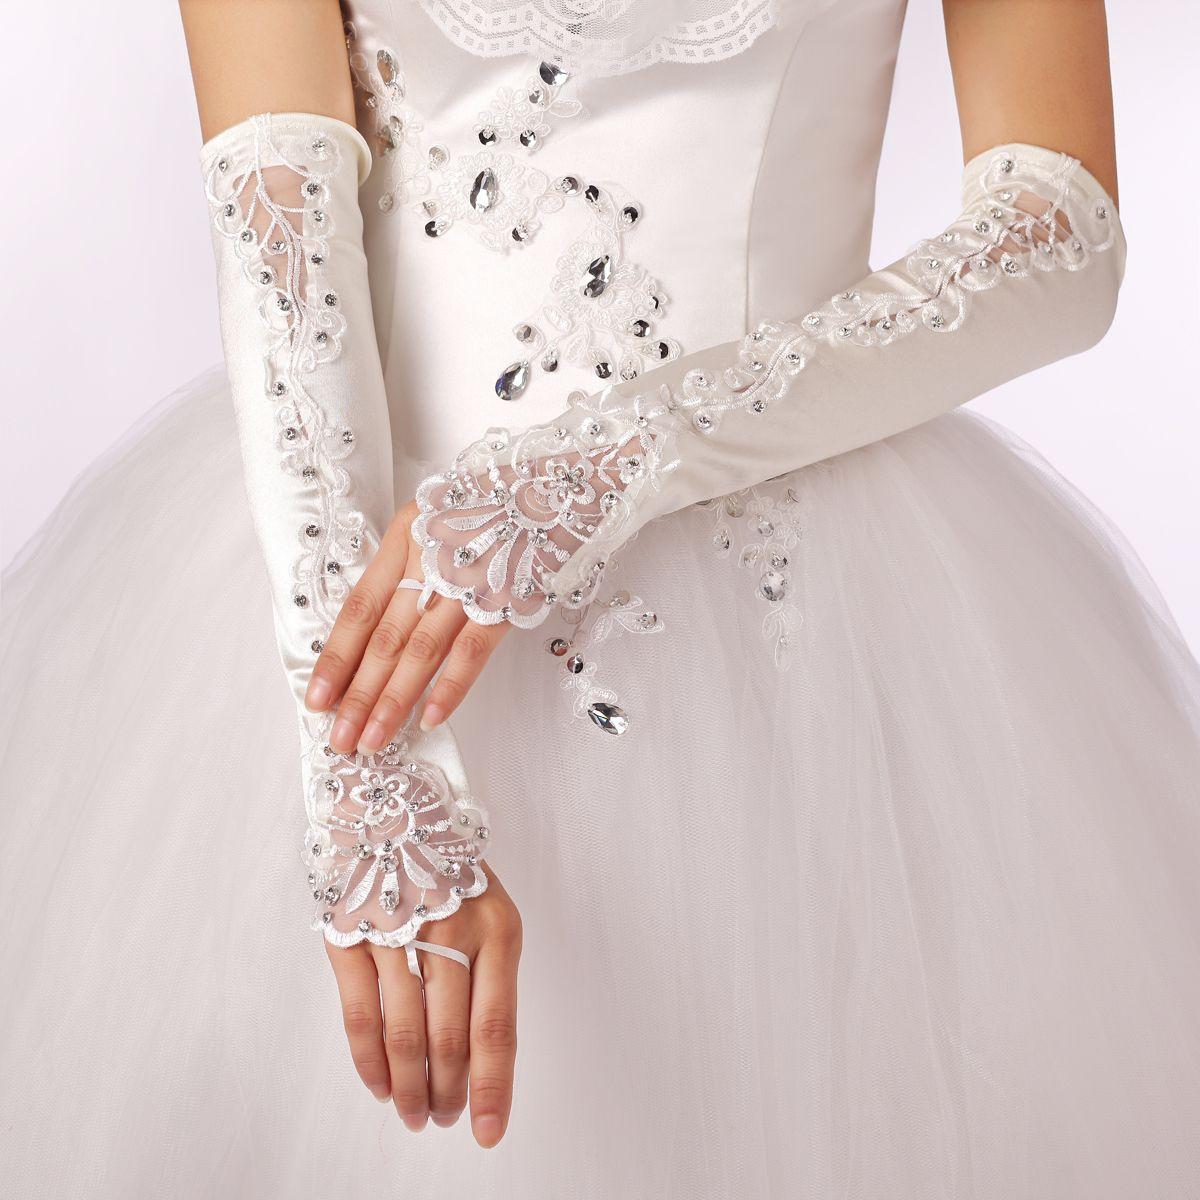 2015 Hote sale gloves Satin beaded bridal Ring Finger Fingerless gloves Crystal Above Elbow Length wedding gloves New Year